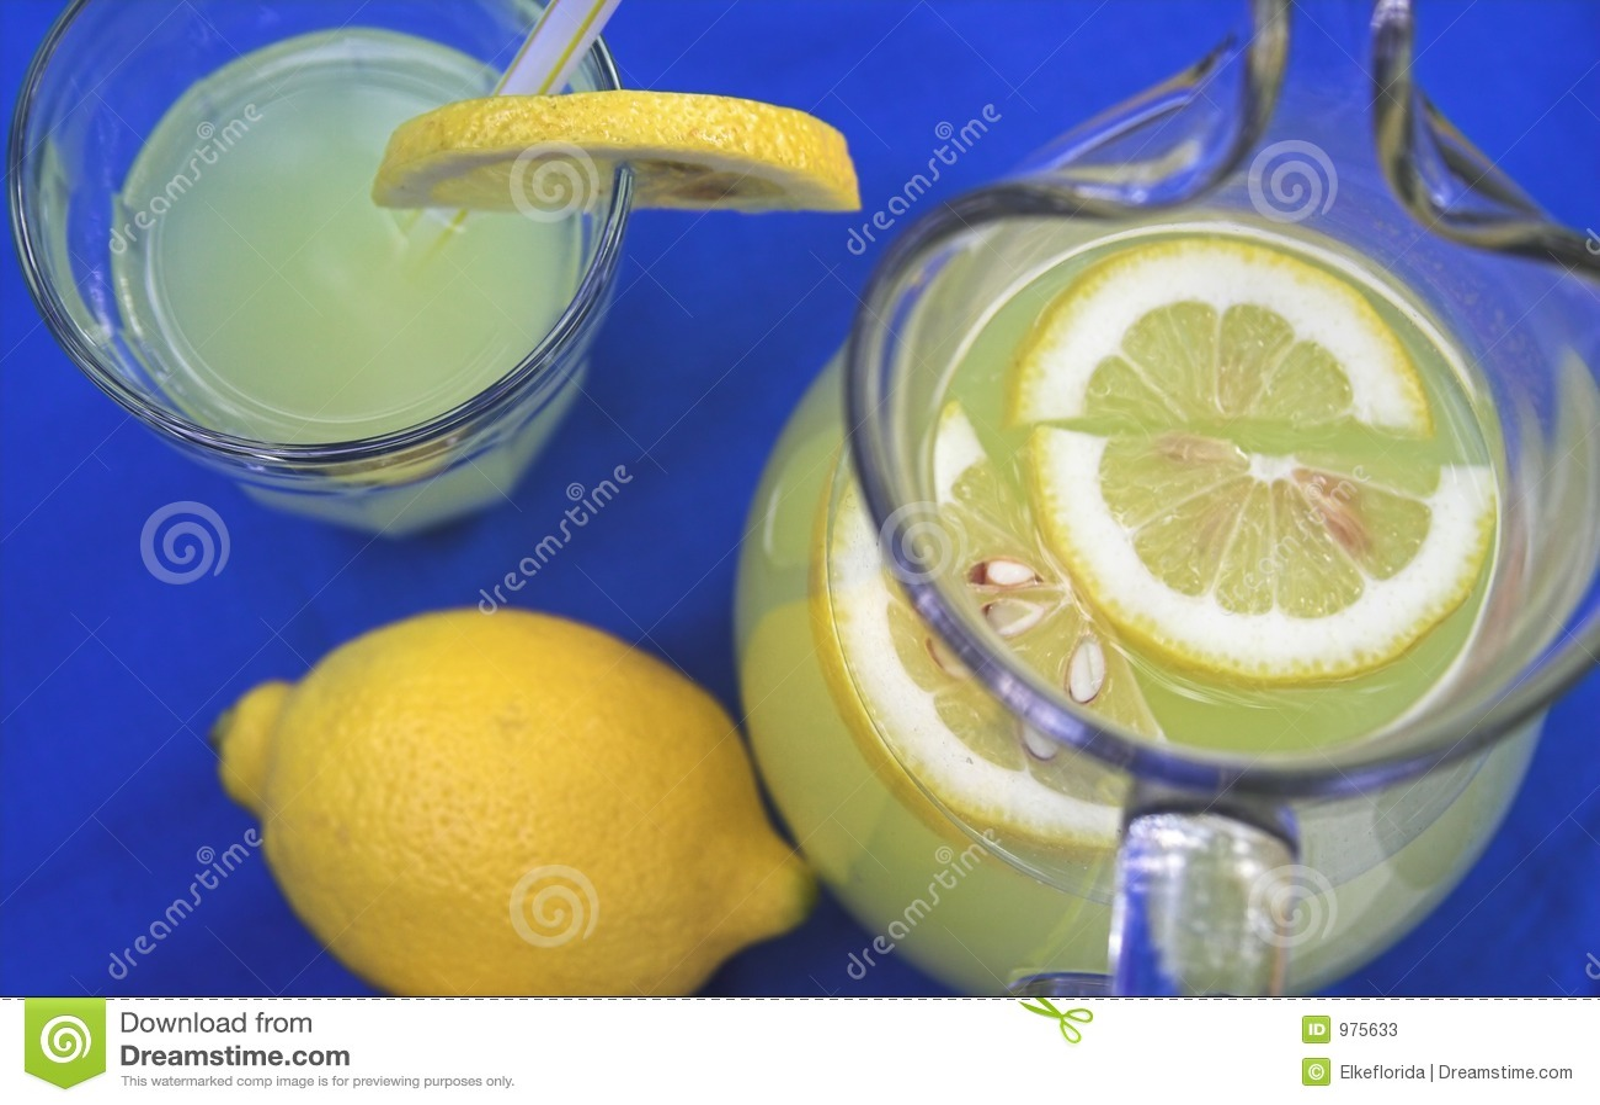 Lemonadekanna